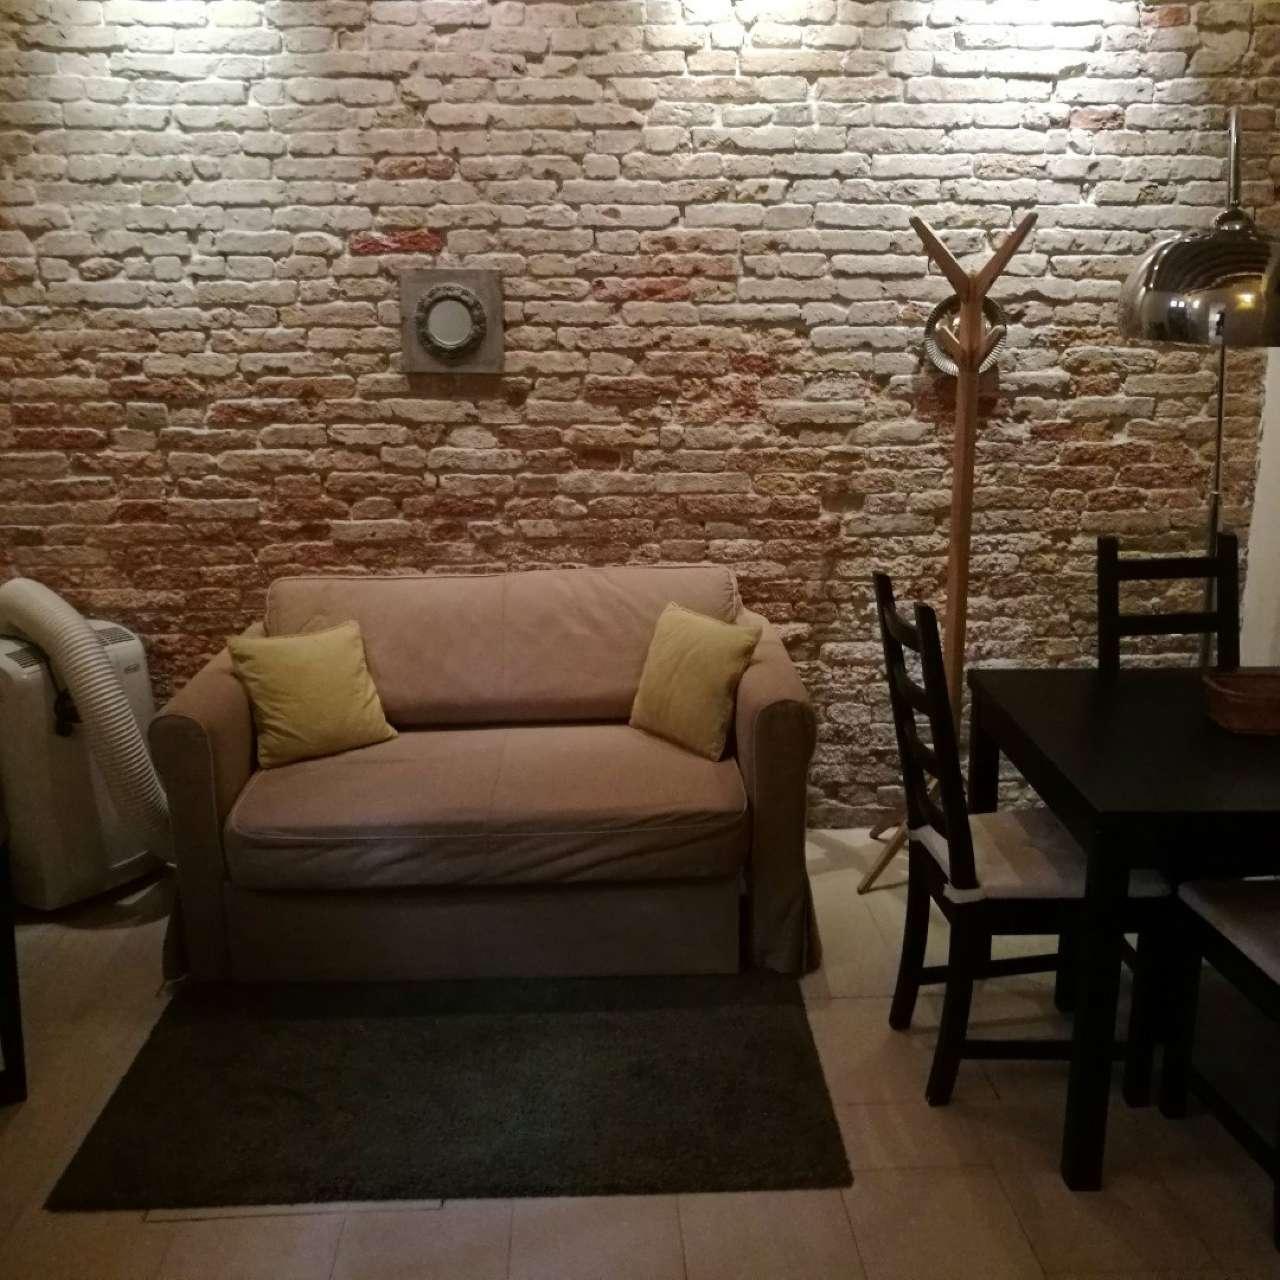 venezia vendita quart: san marco agenzia immobiliare san leonardo